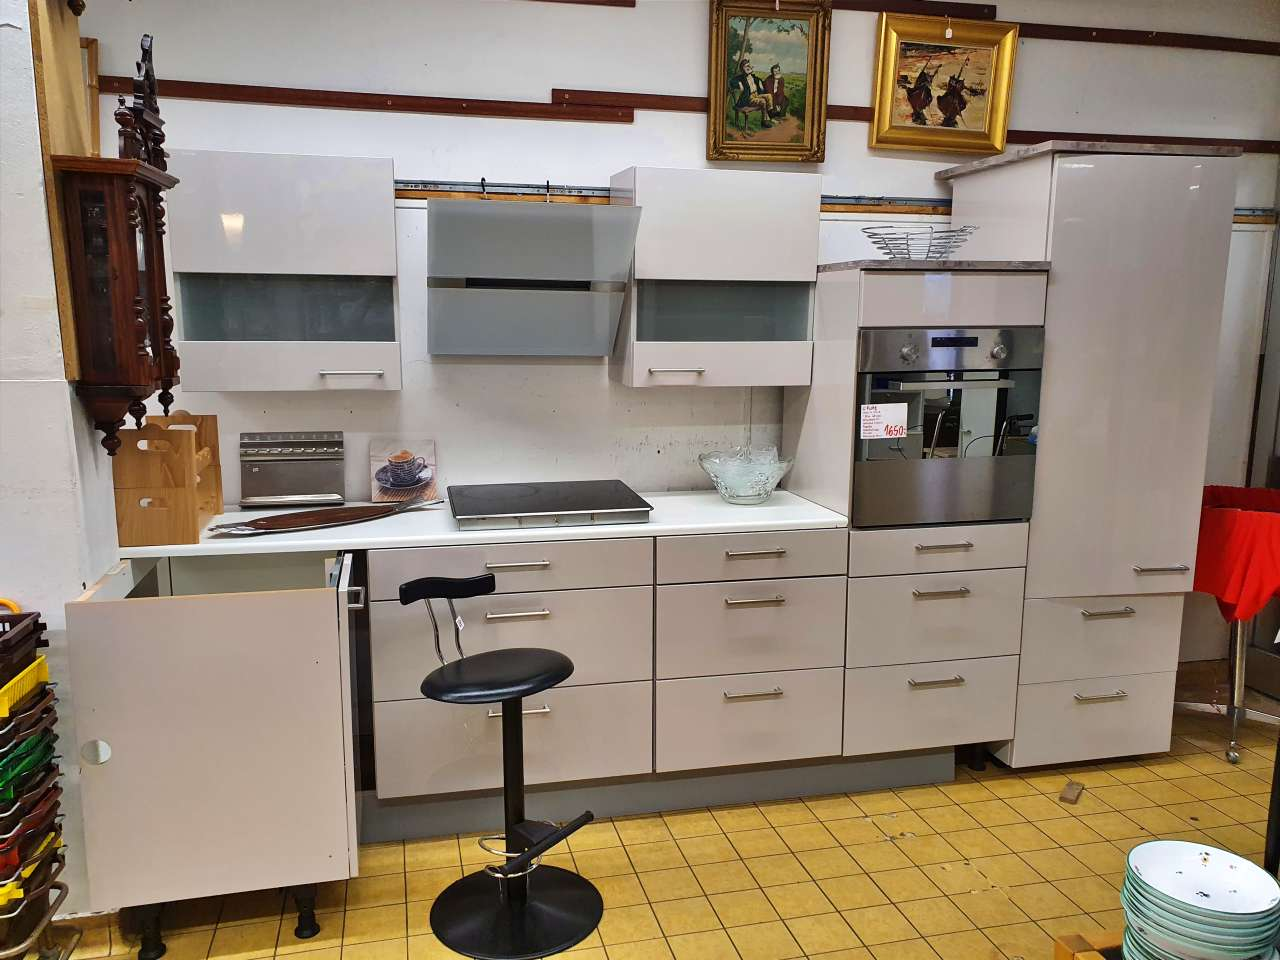 Einbauküche mit E-Geräten taupe hell